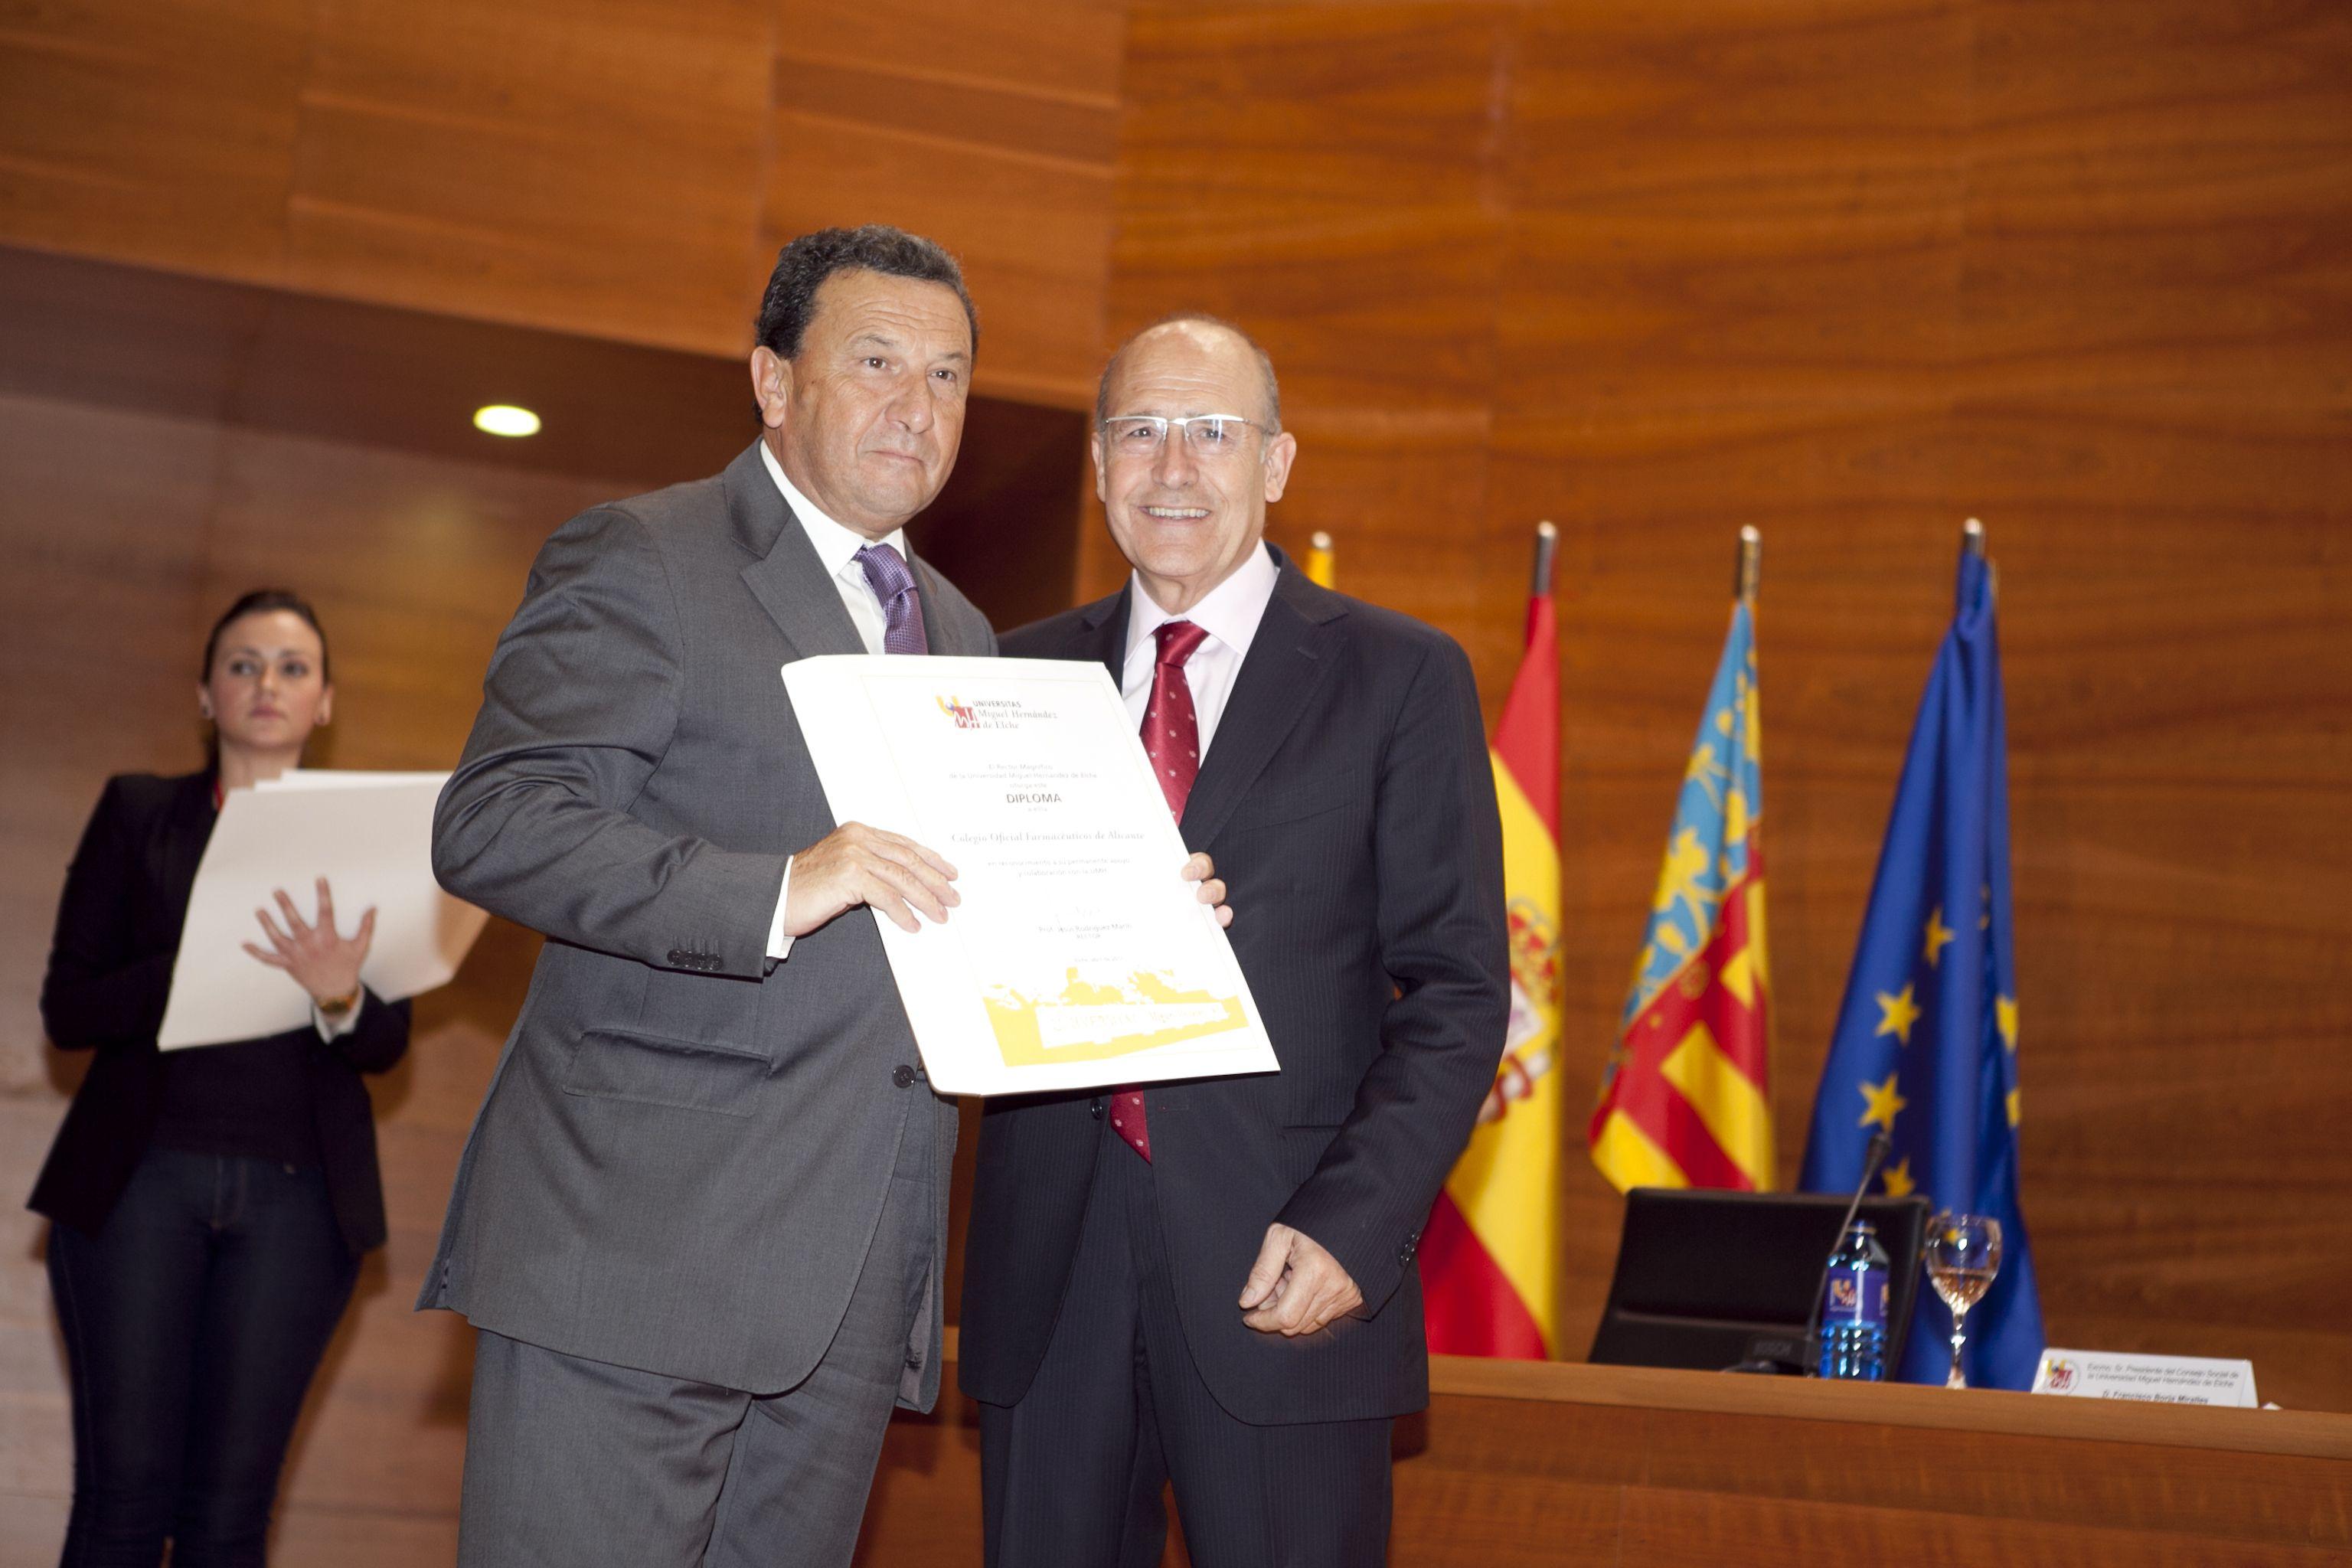 umh-diplomas-rector_mg_6905.jpg